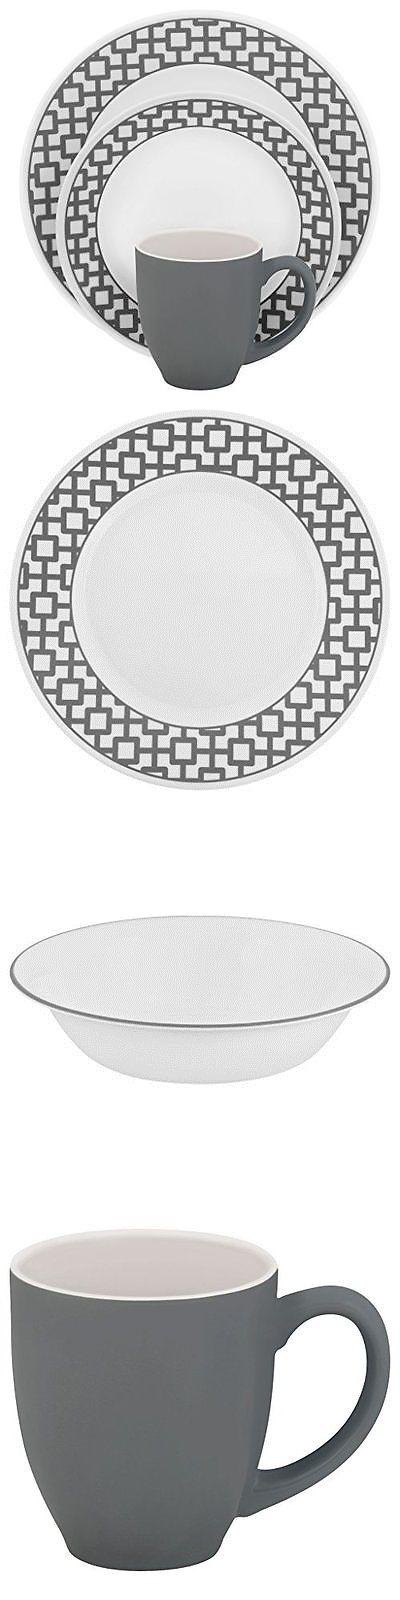 Dinner Service Sets 36032 Corelle Impressions 16 Piece Dinnerware